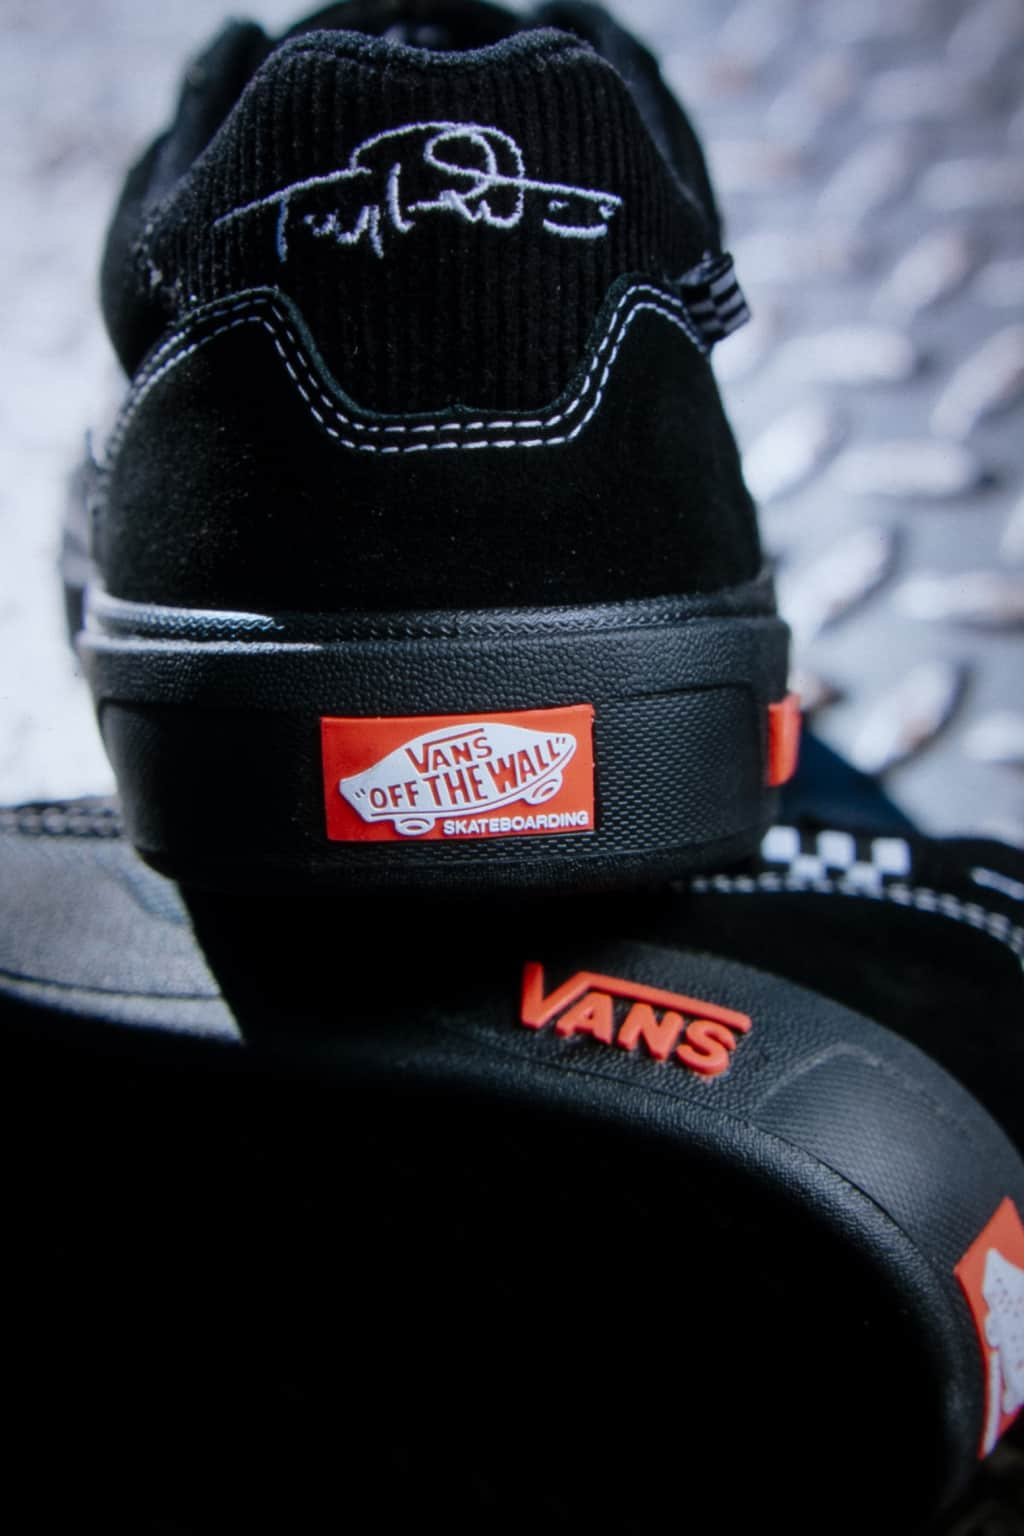 Vans Presents The Wayvee Tyson Peterson Colorway